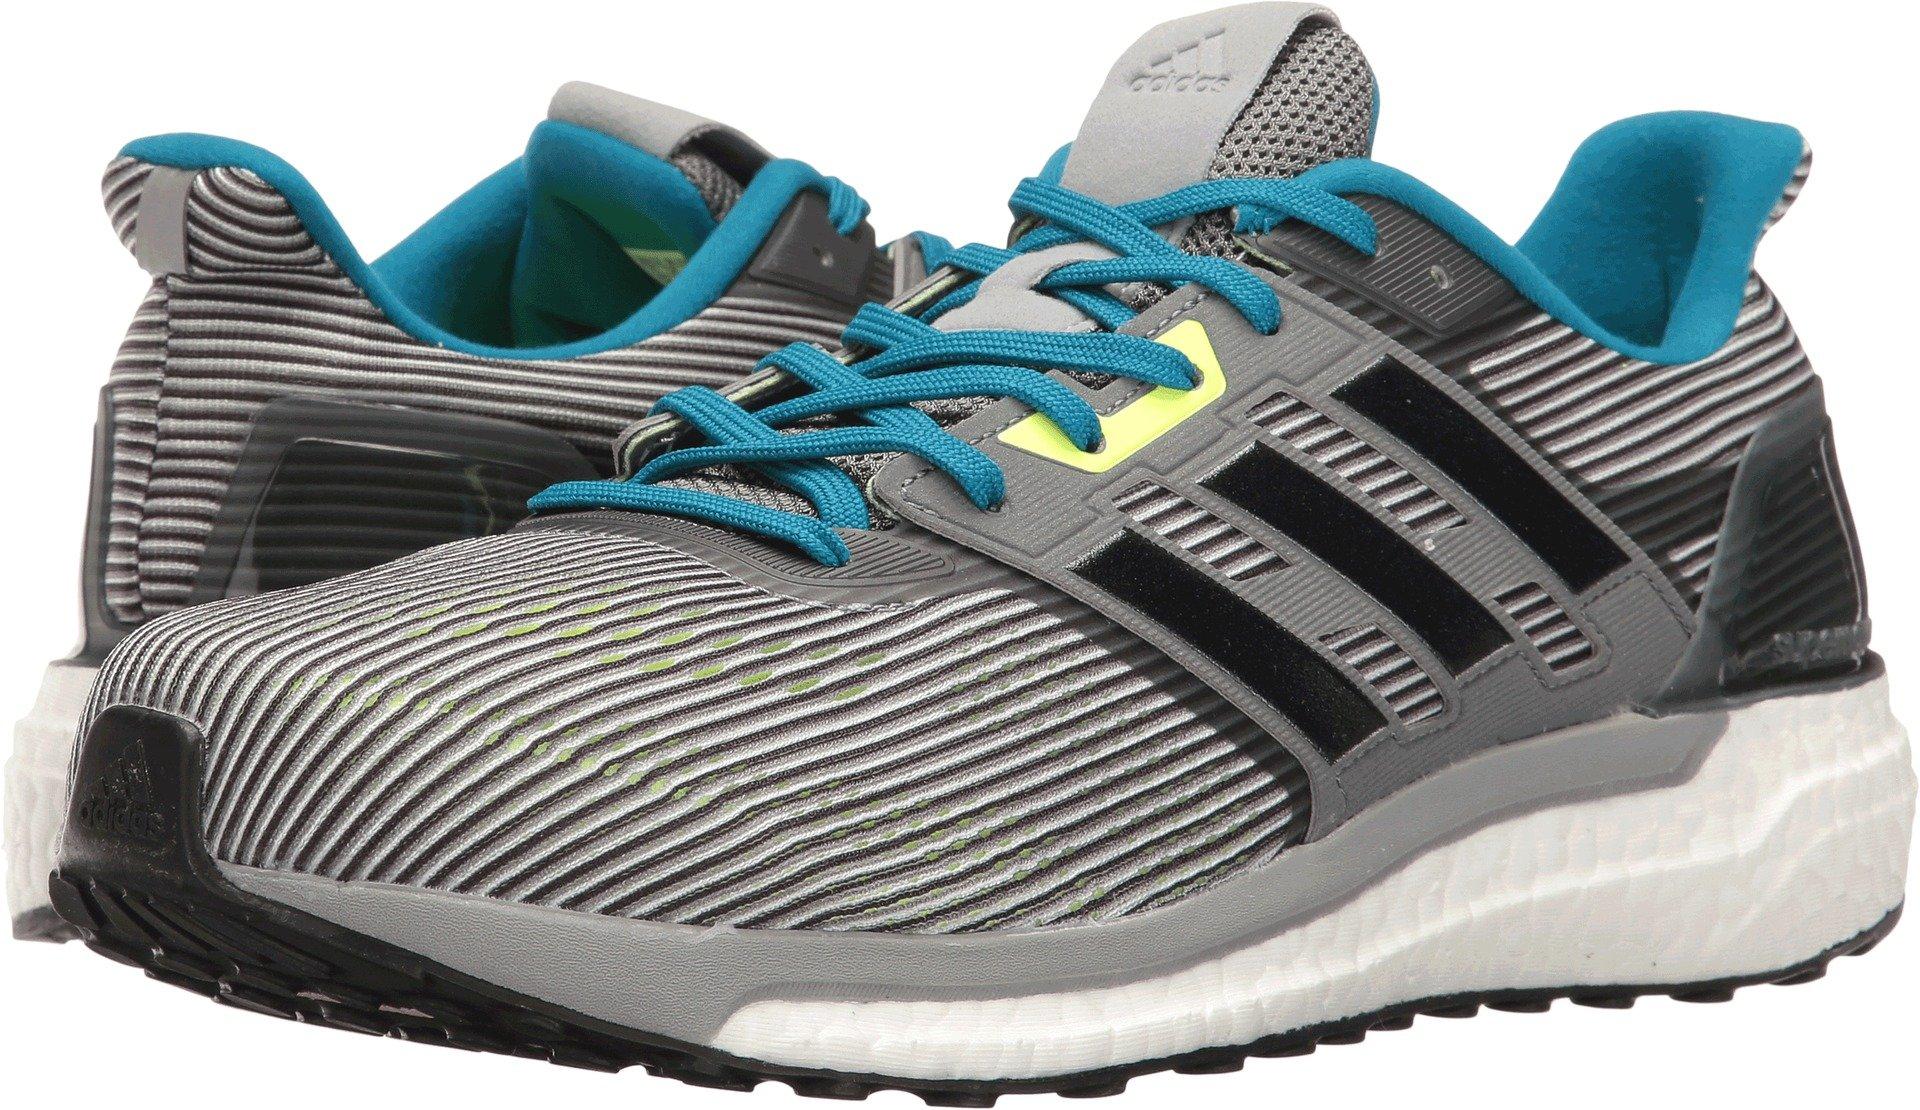 finest selection 7202d 5bb88 Galleon - Adidas Men s Supernova M Running Shoe, Vista Grey Black Unity Blue,  9 Medium US